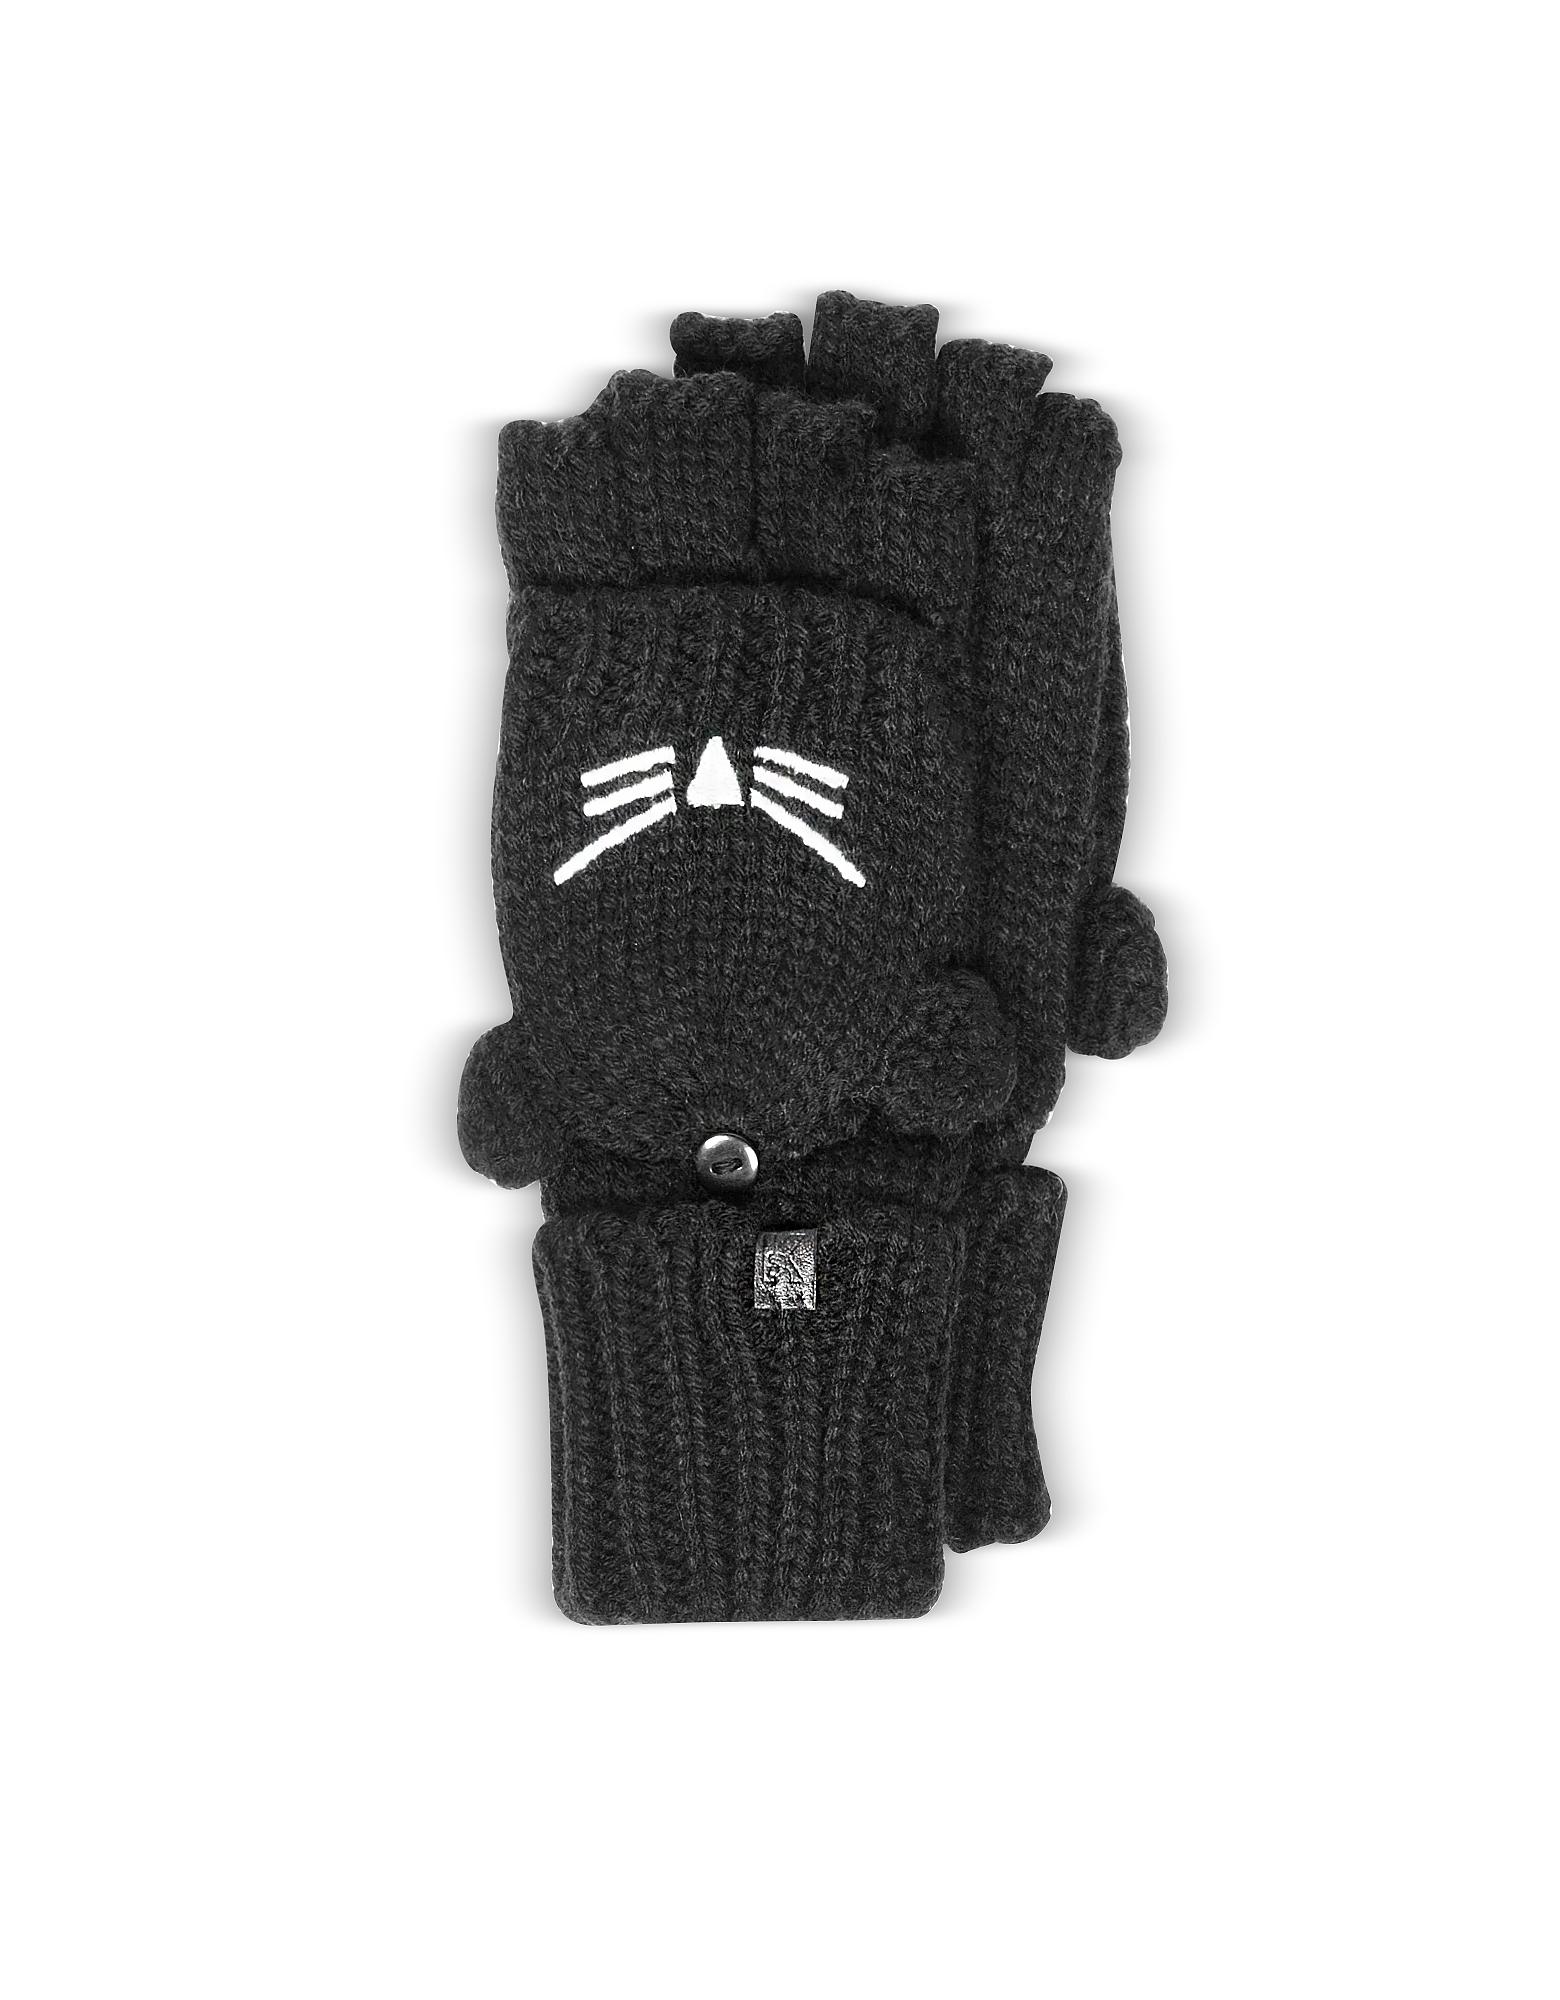 Karl Lagerfeld Choupette - Черные Перчатки из Смеси Шерсти